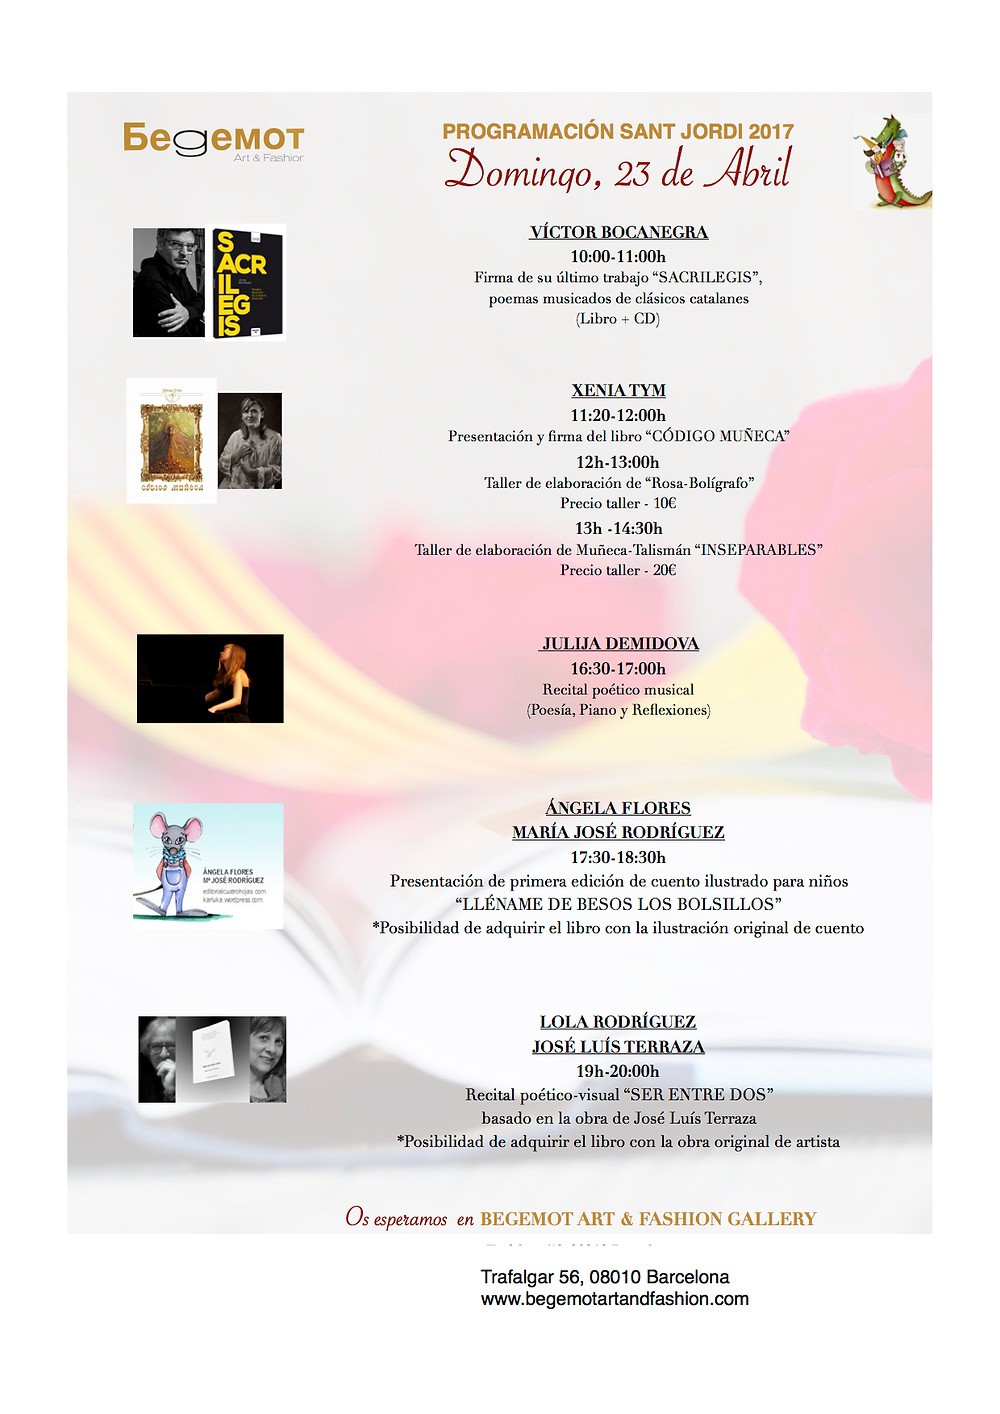 Programación Sant Jordi 2017